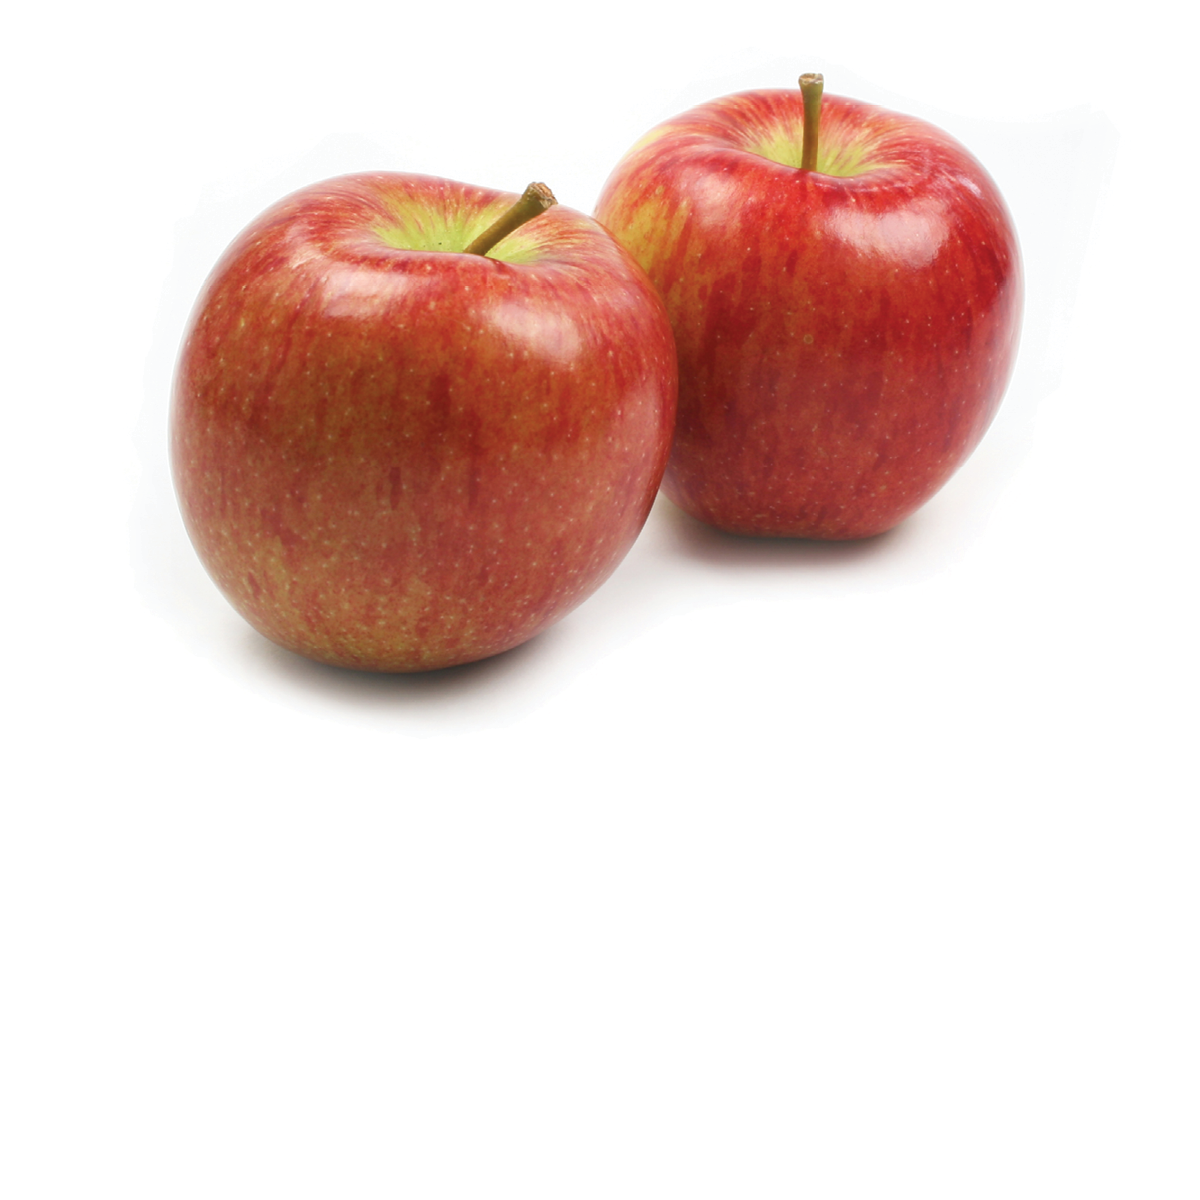 ORGANIC Braeburn Apples